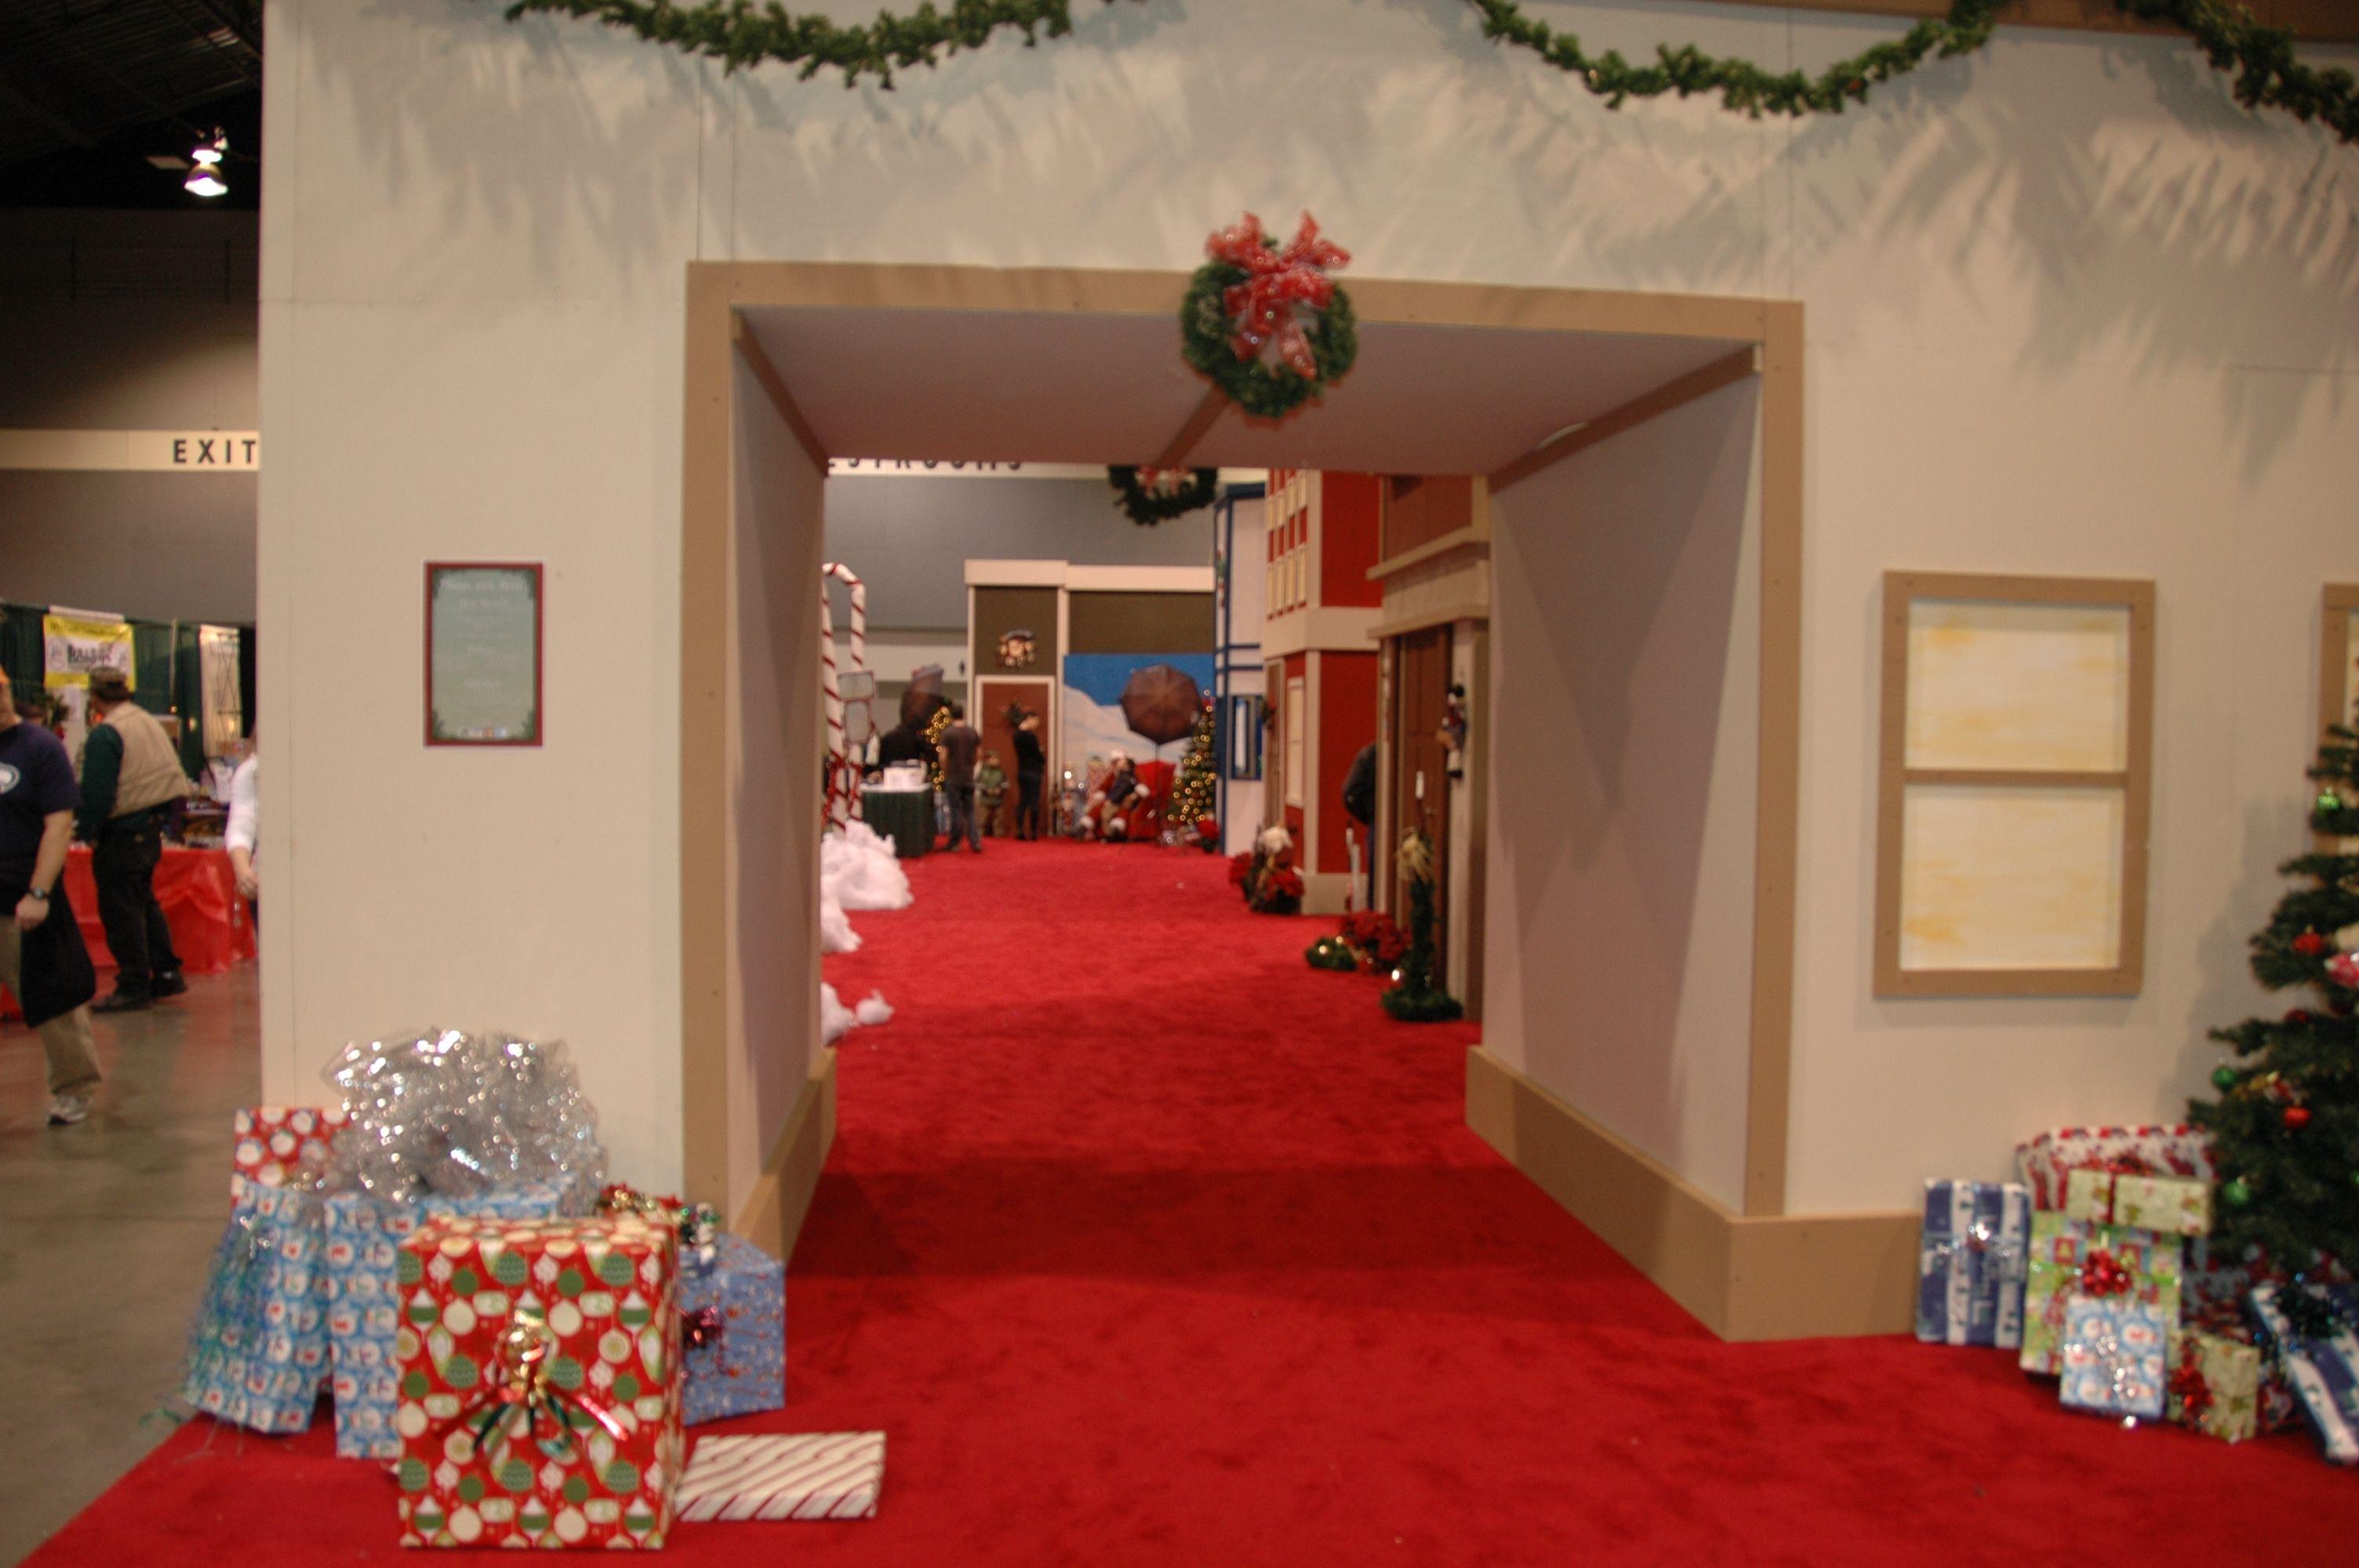 come check out santas village at americas largest christmas bazaar - Americas Largest Christmas Bazaar